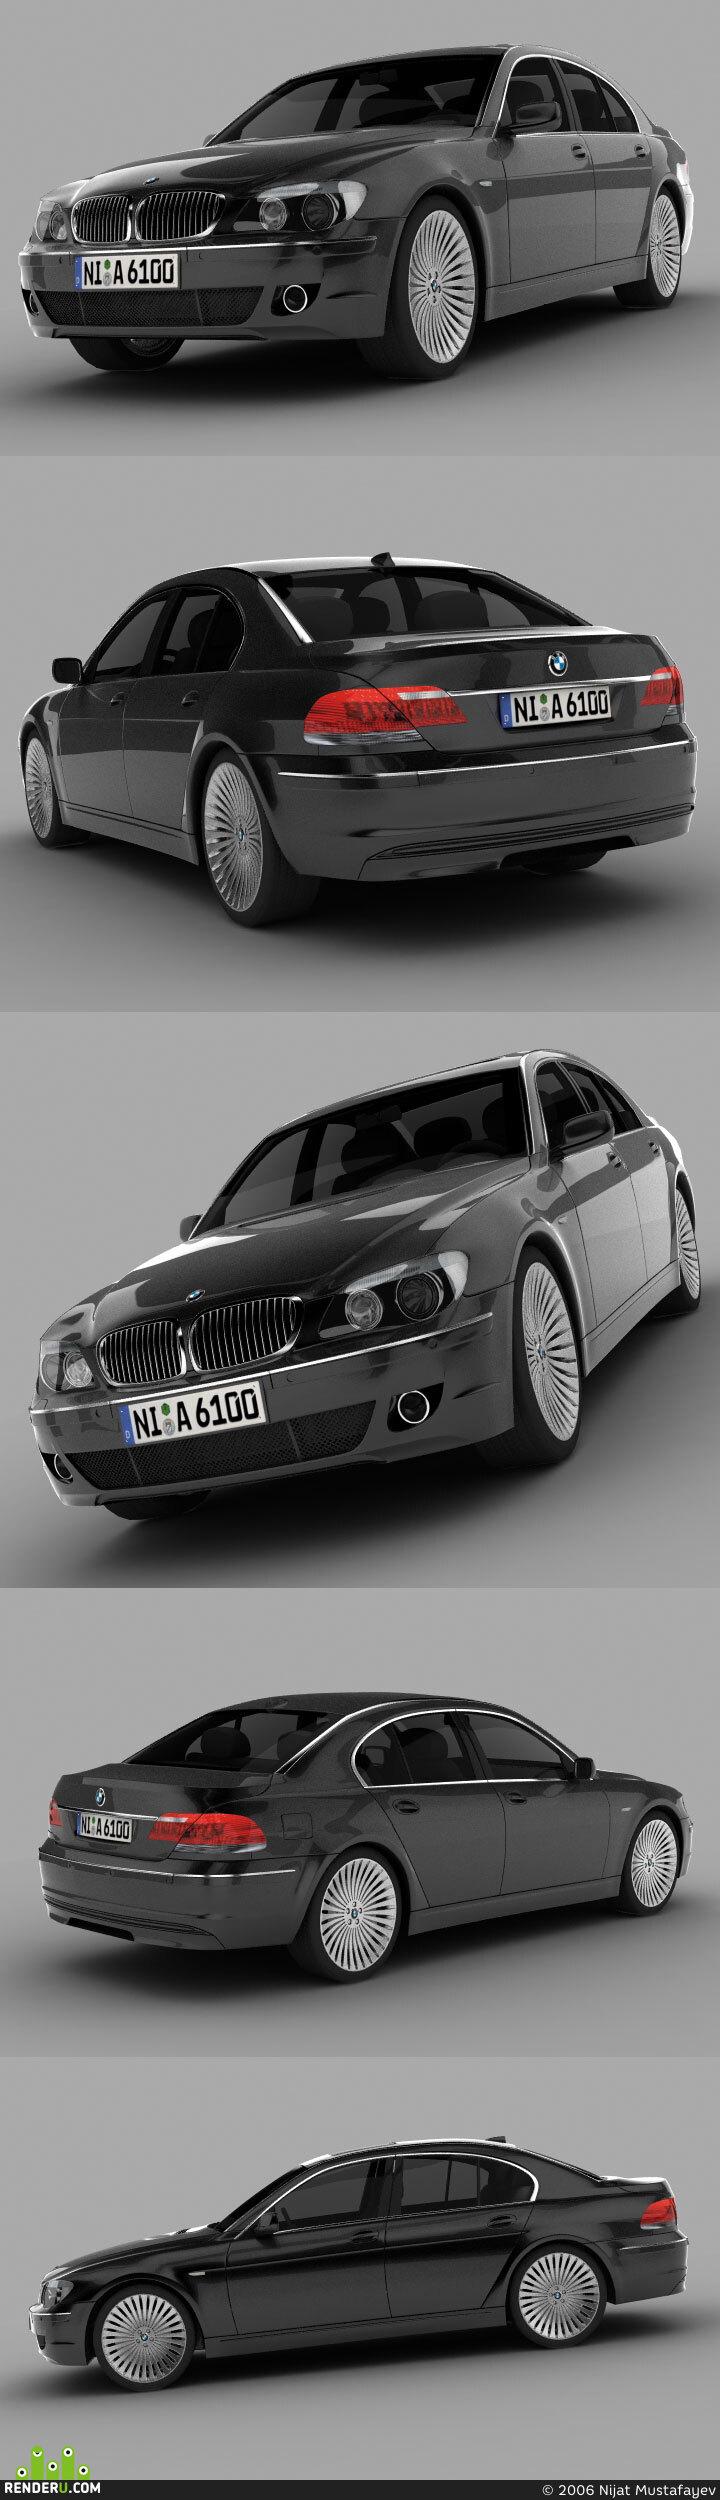 preview BMW 7 Series 2006 (E65)